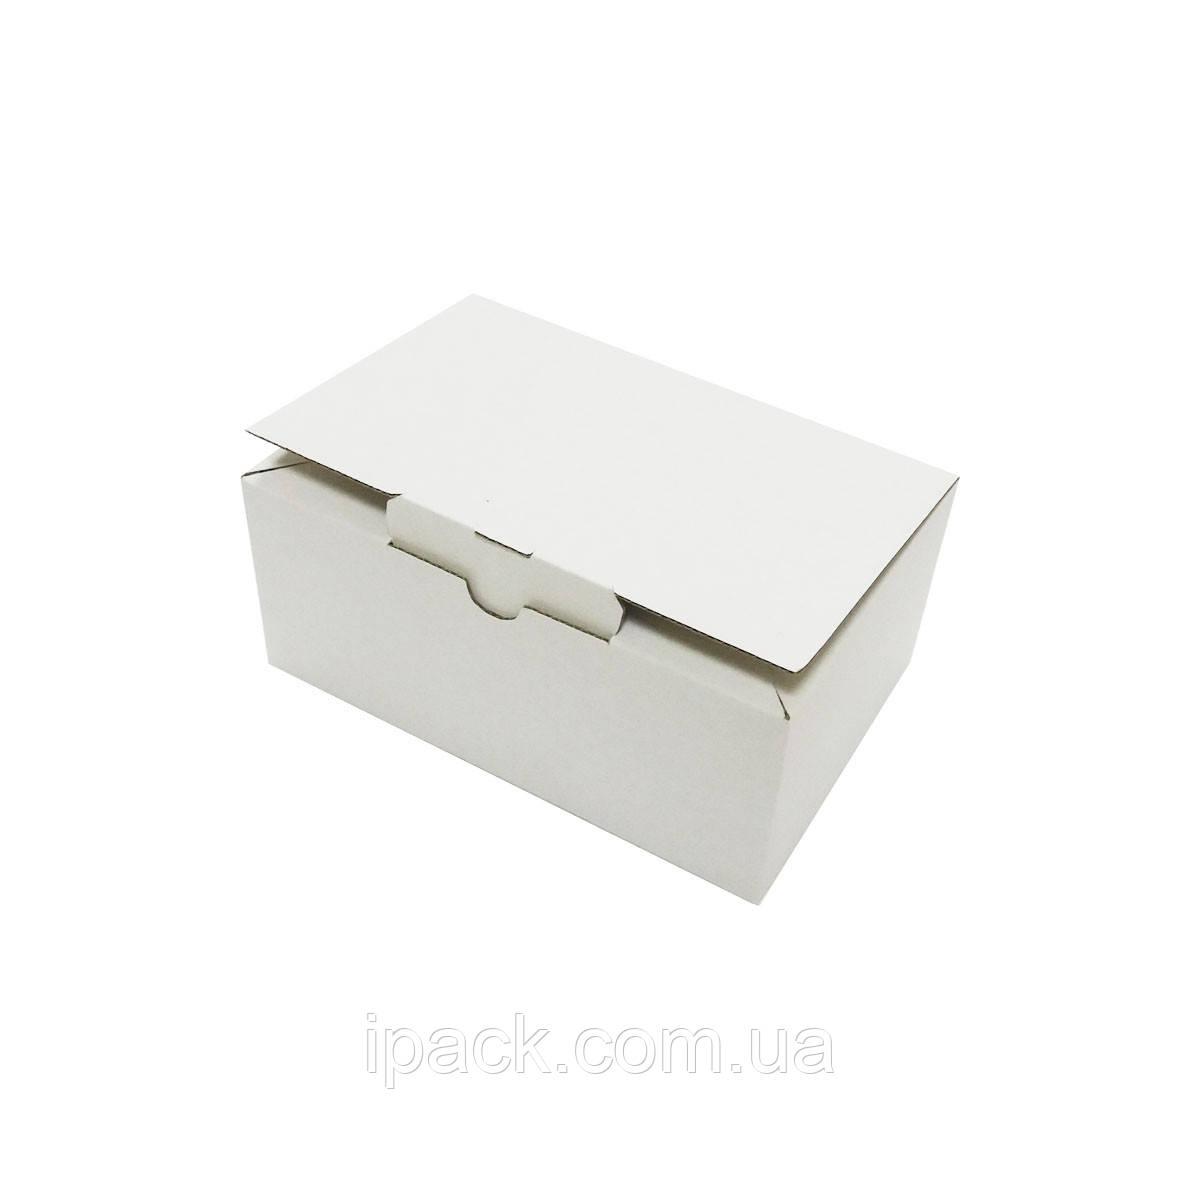 Коробка картонная самосборная, 145*95*60, мм, белая, микрогофрокартон